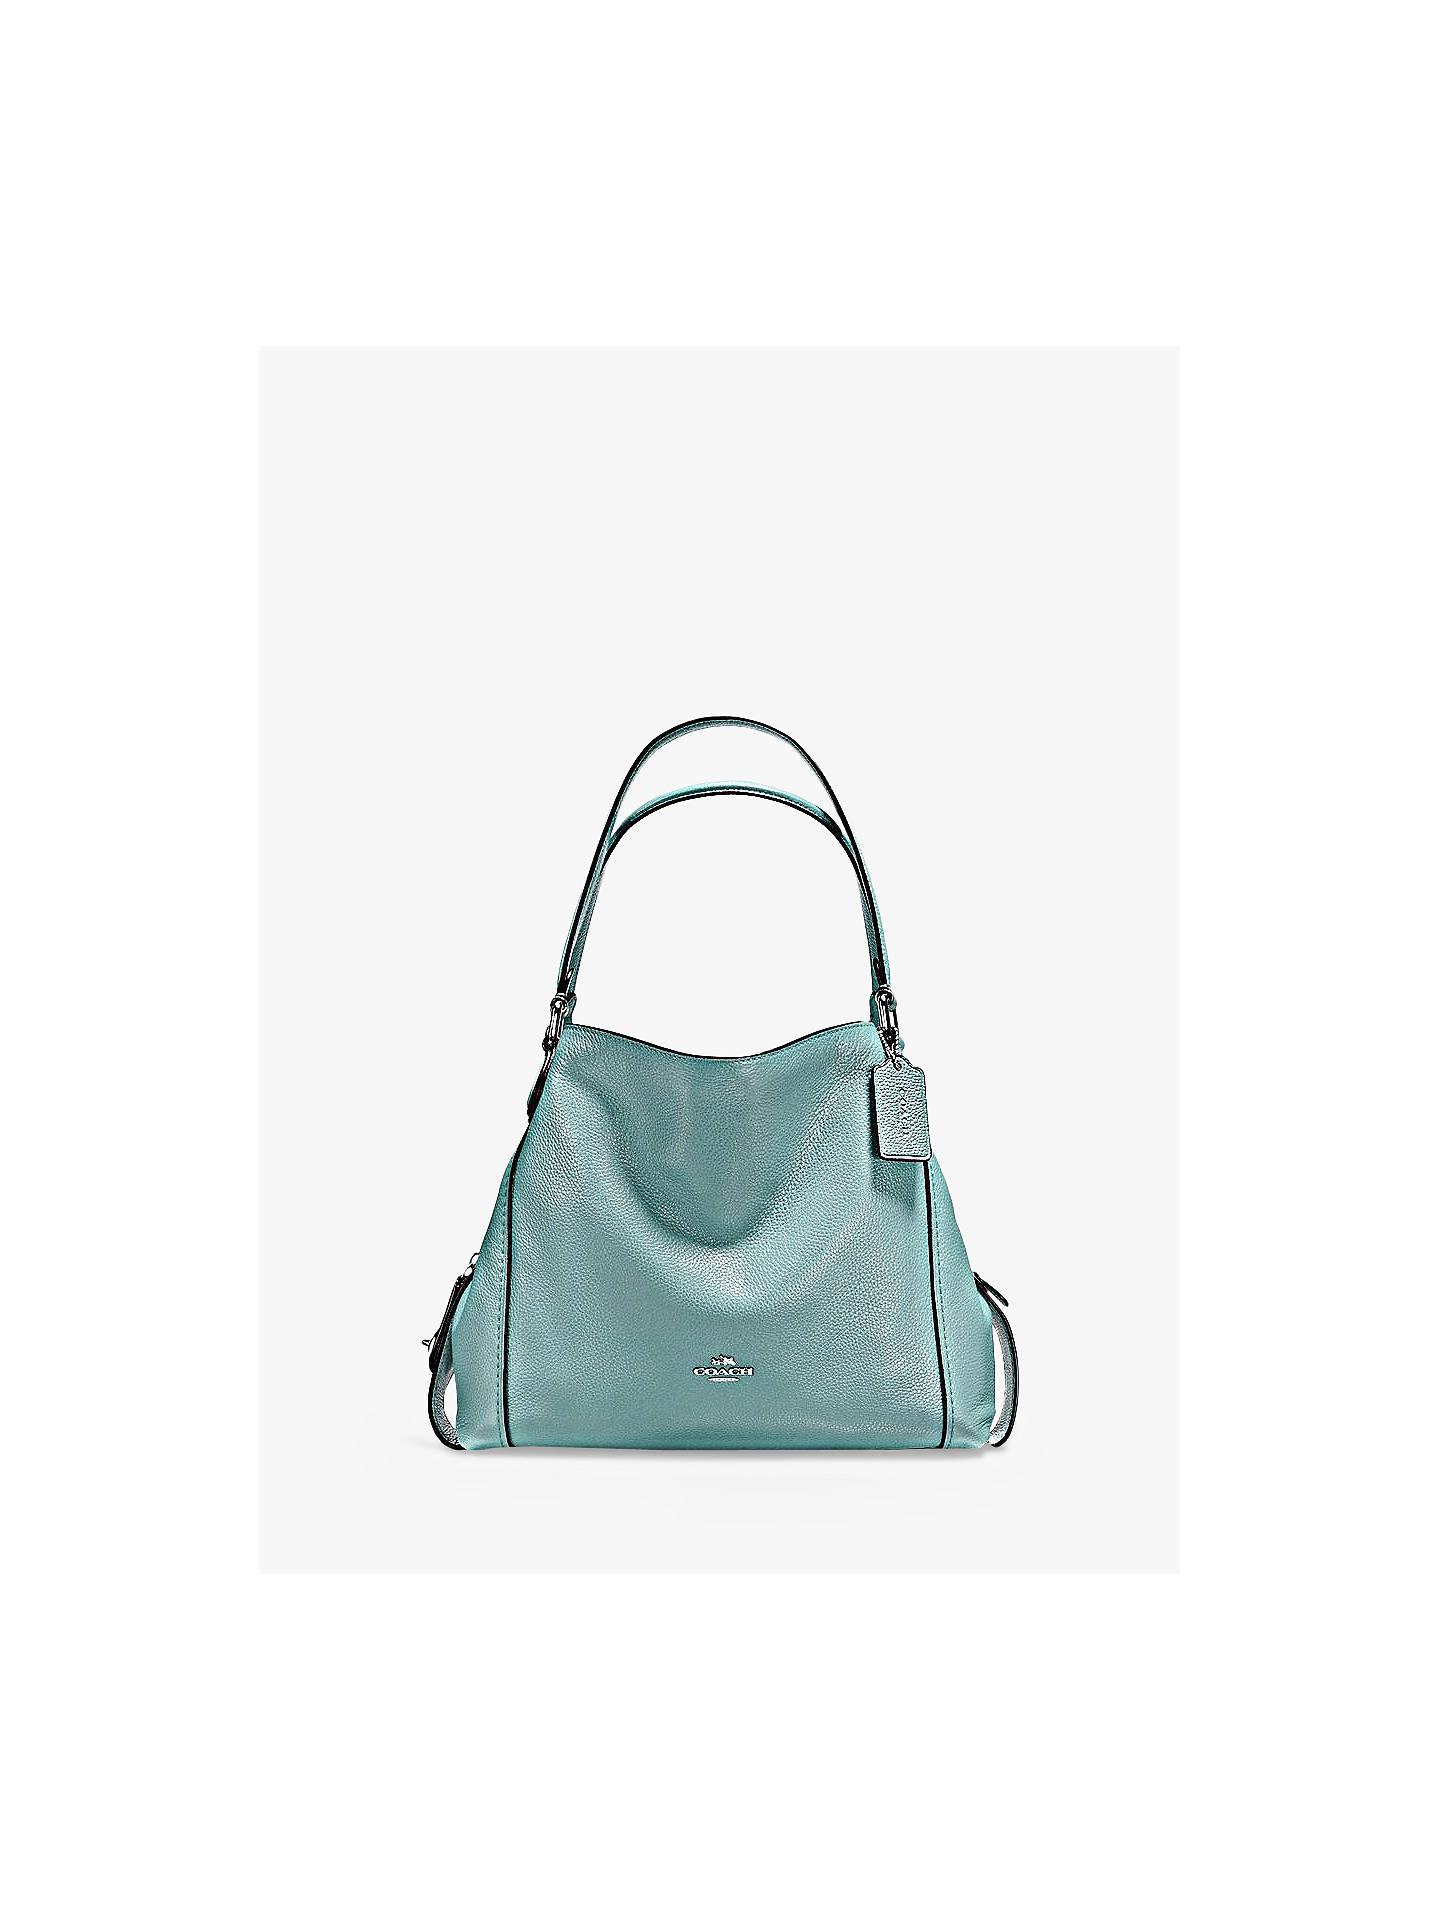 267b7259e33e3 Buy Coach Edie 31 Polished Pebble Leather Shoulder Bag